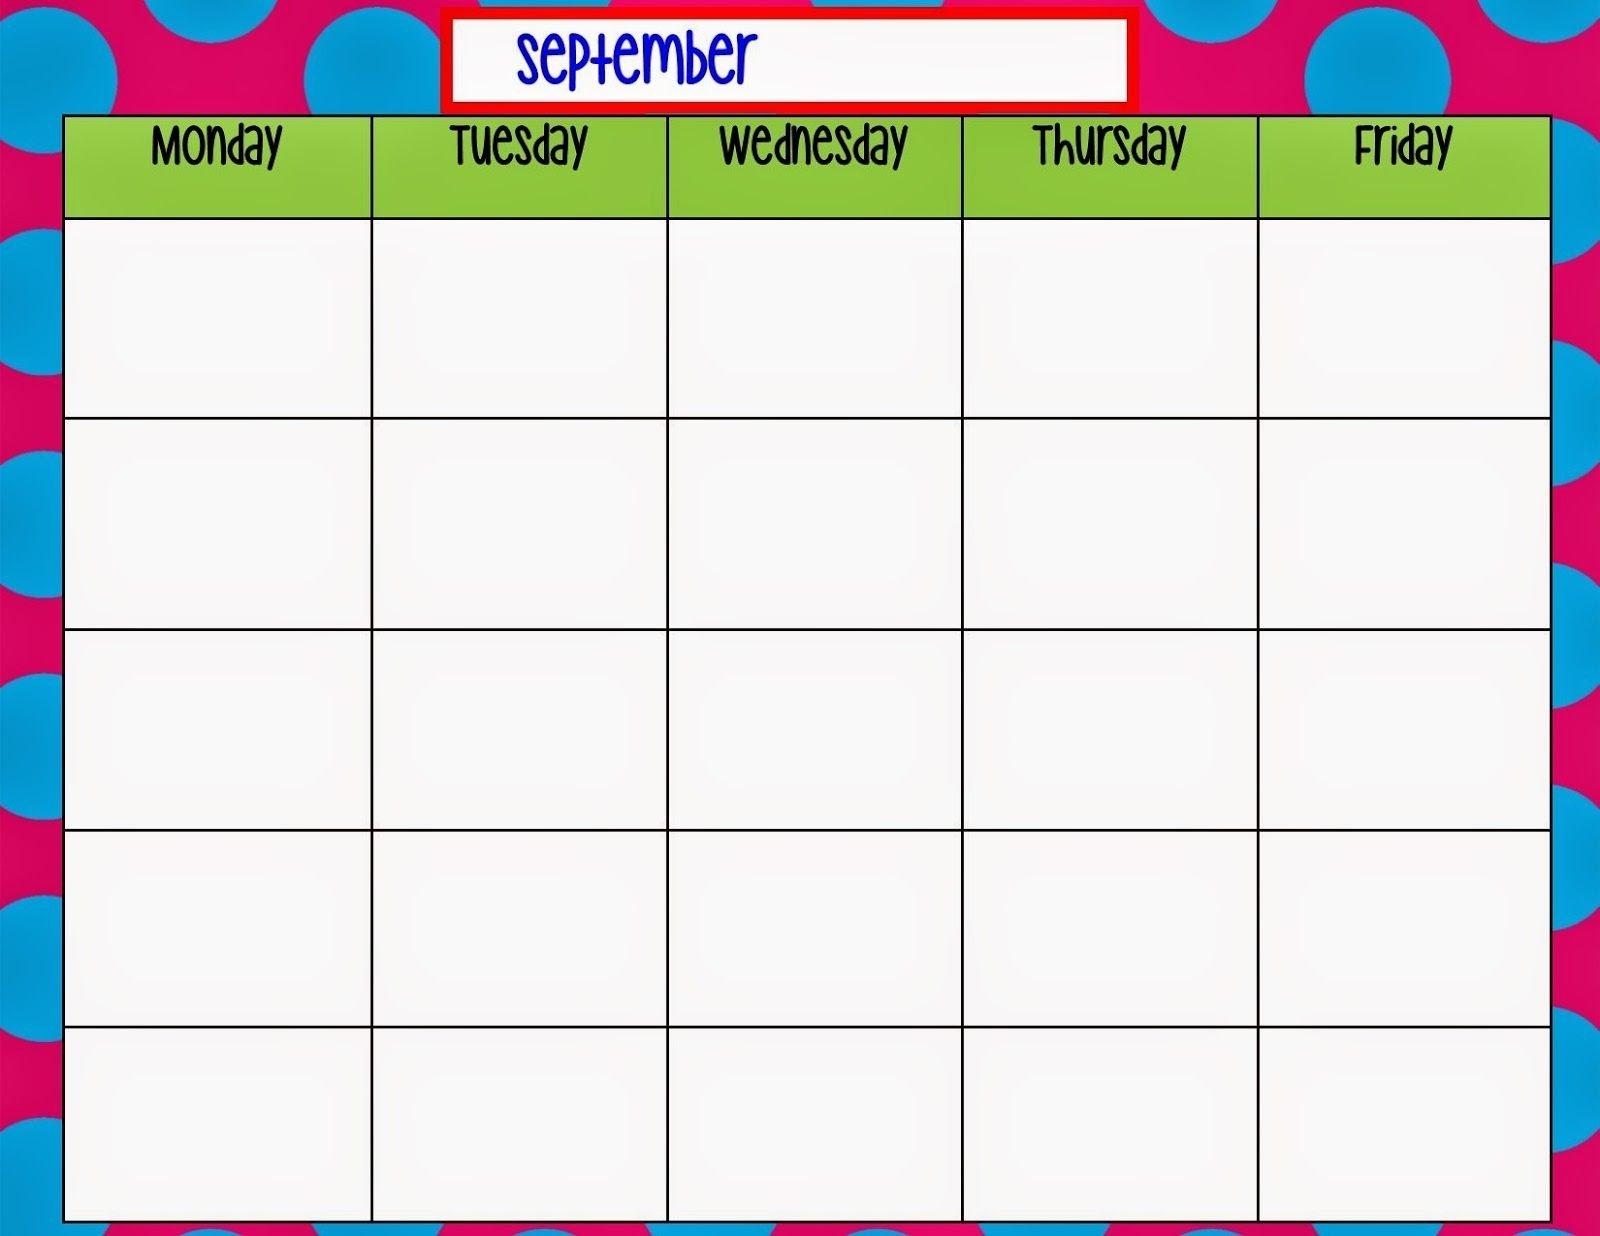 Monday Through Friday Schedule Printable - Calendar Lined Monday Through Friday